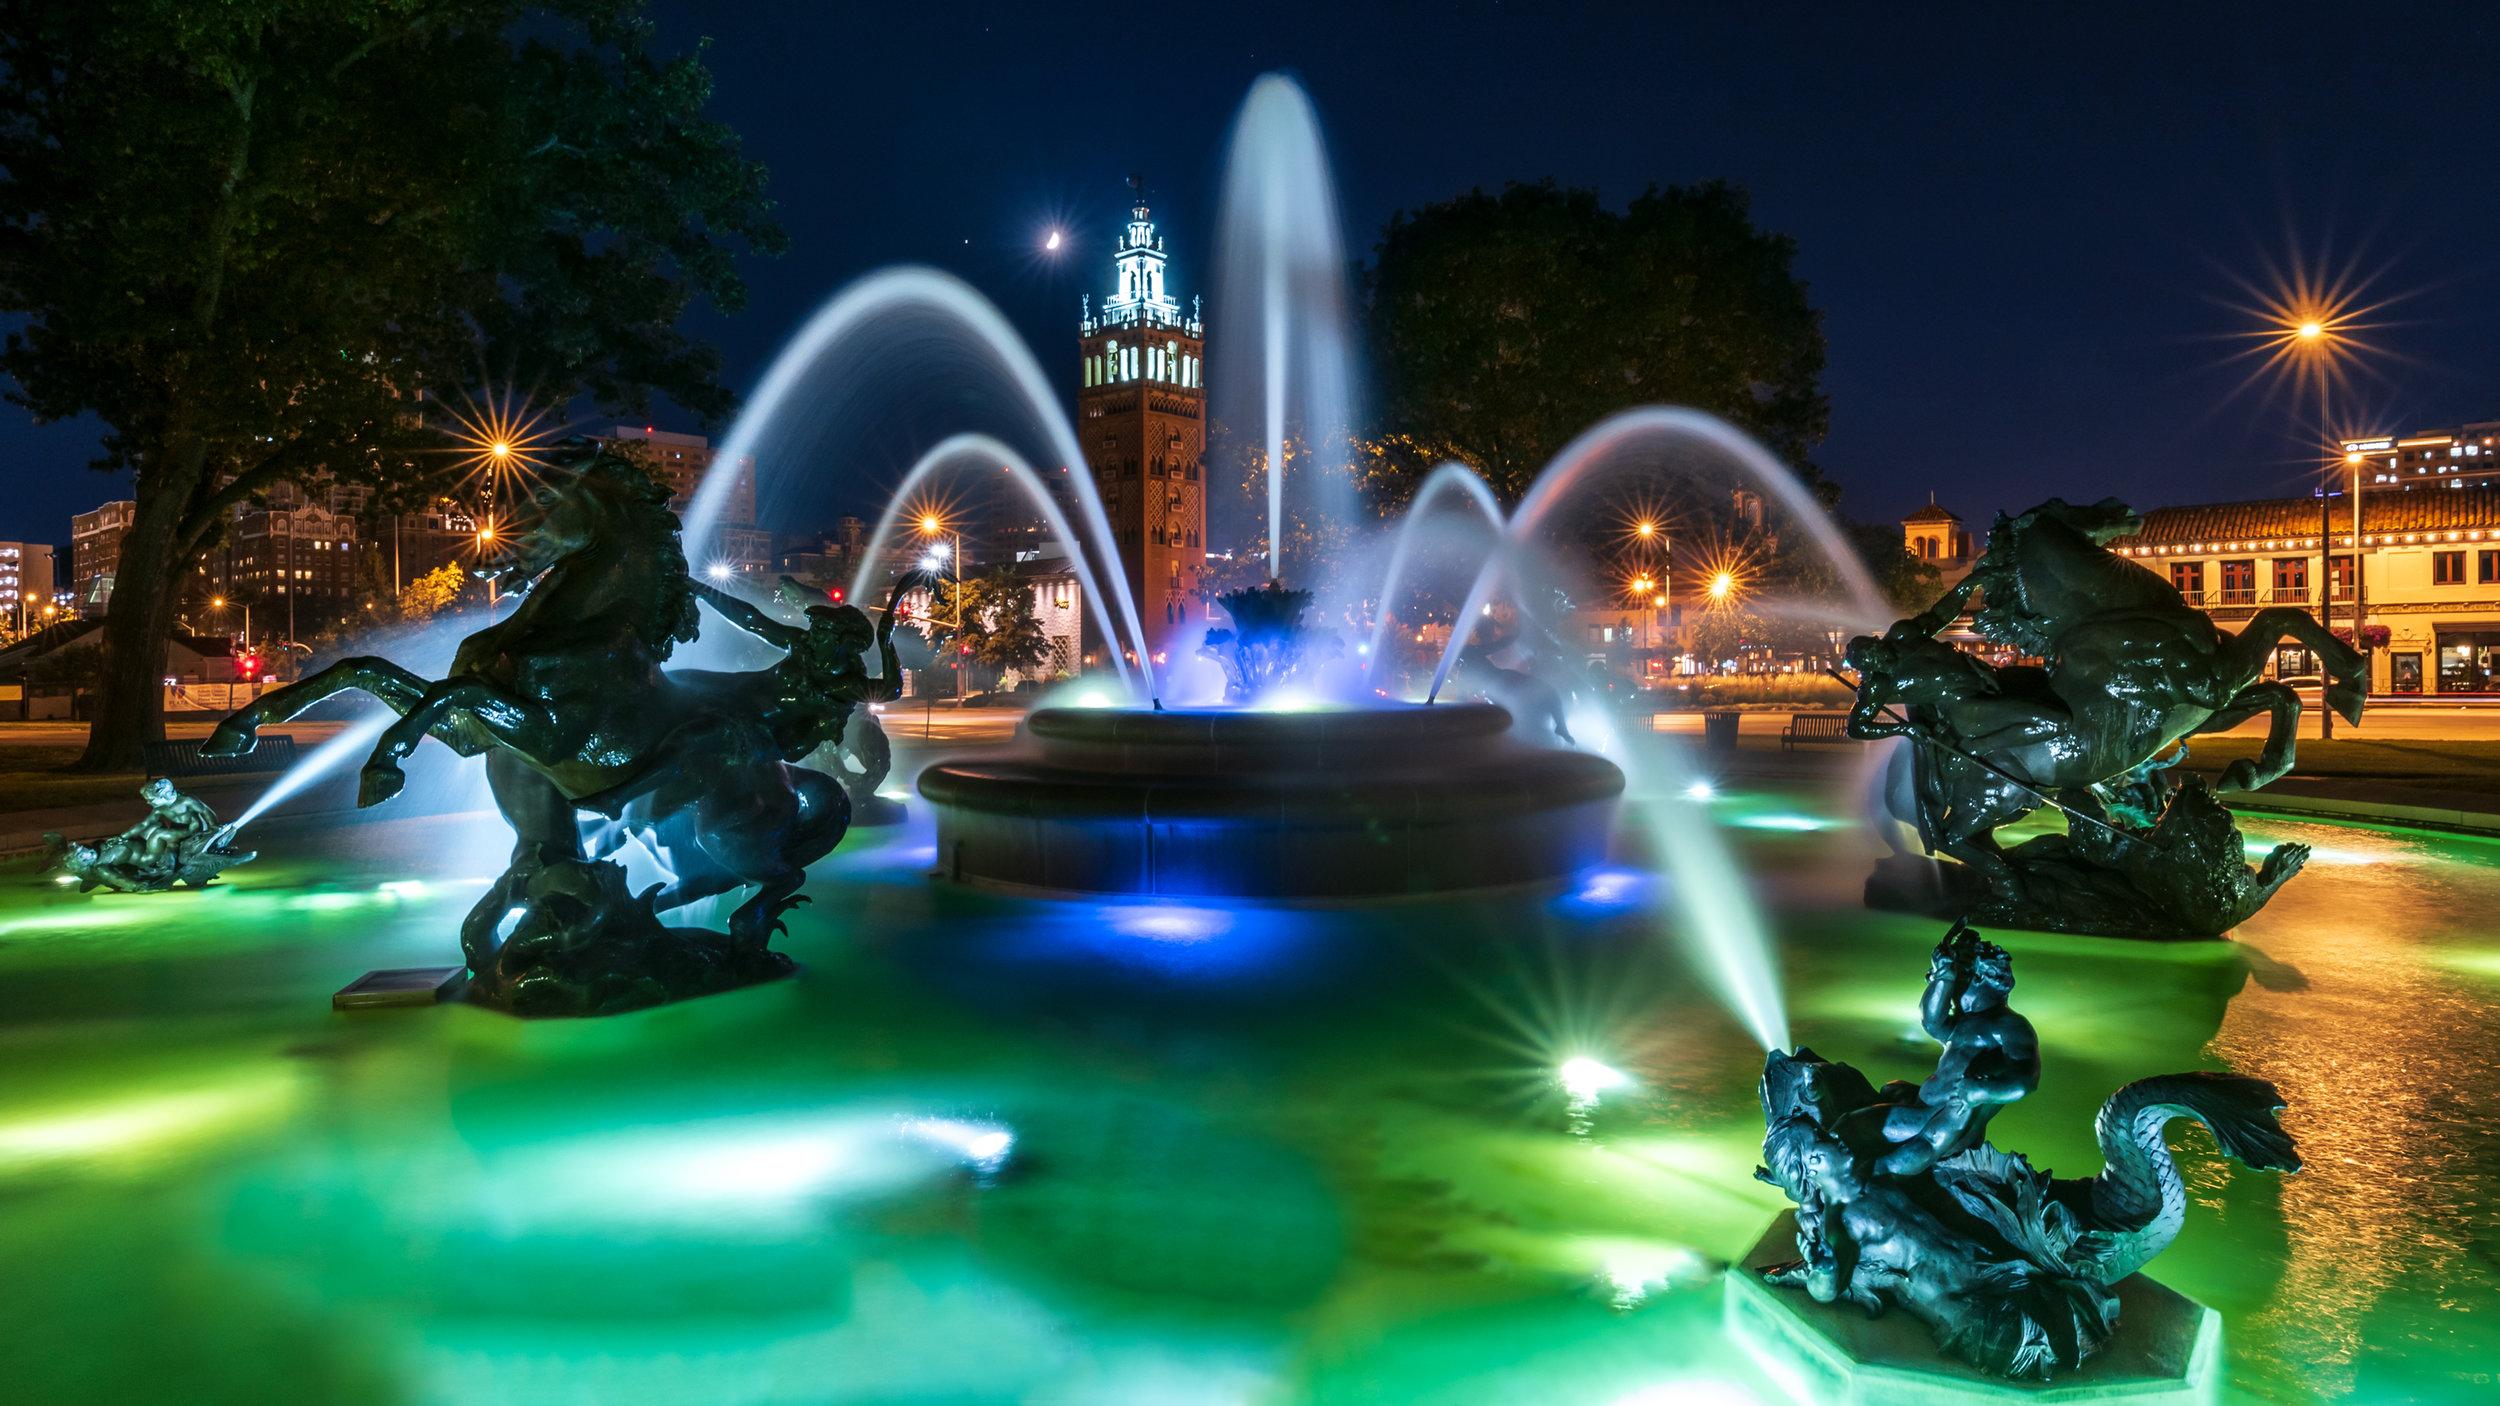 jc-nichols-fountain-night-190905-v2.jpg